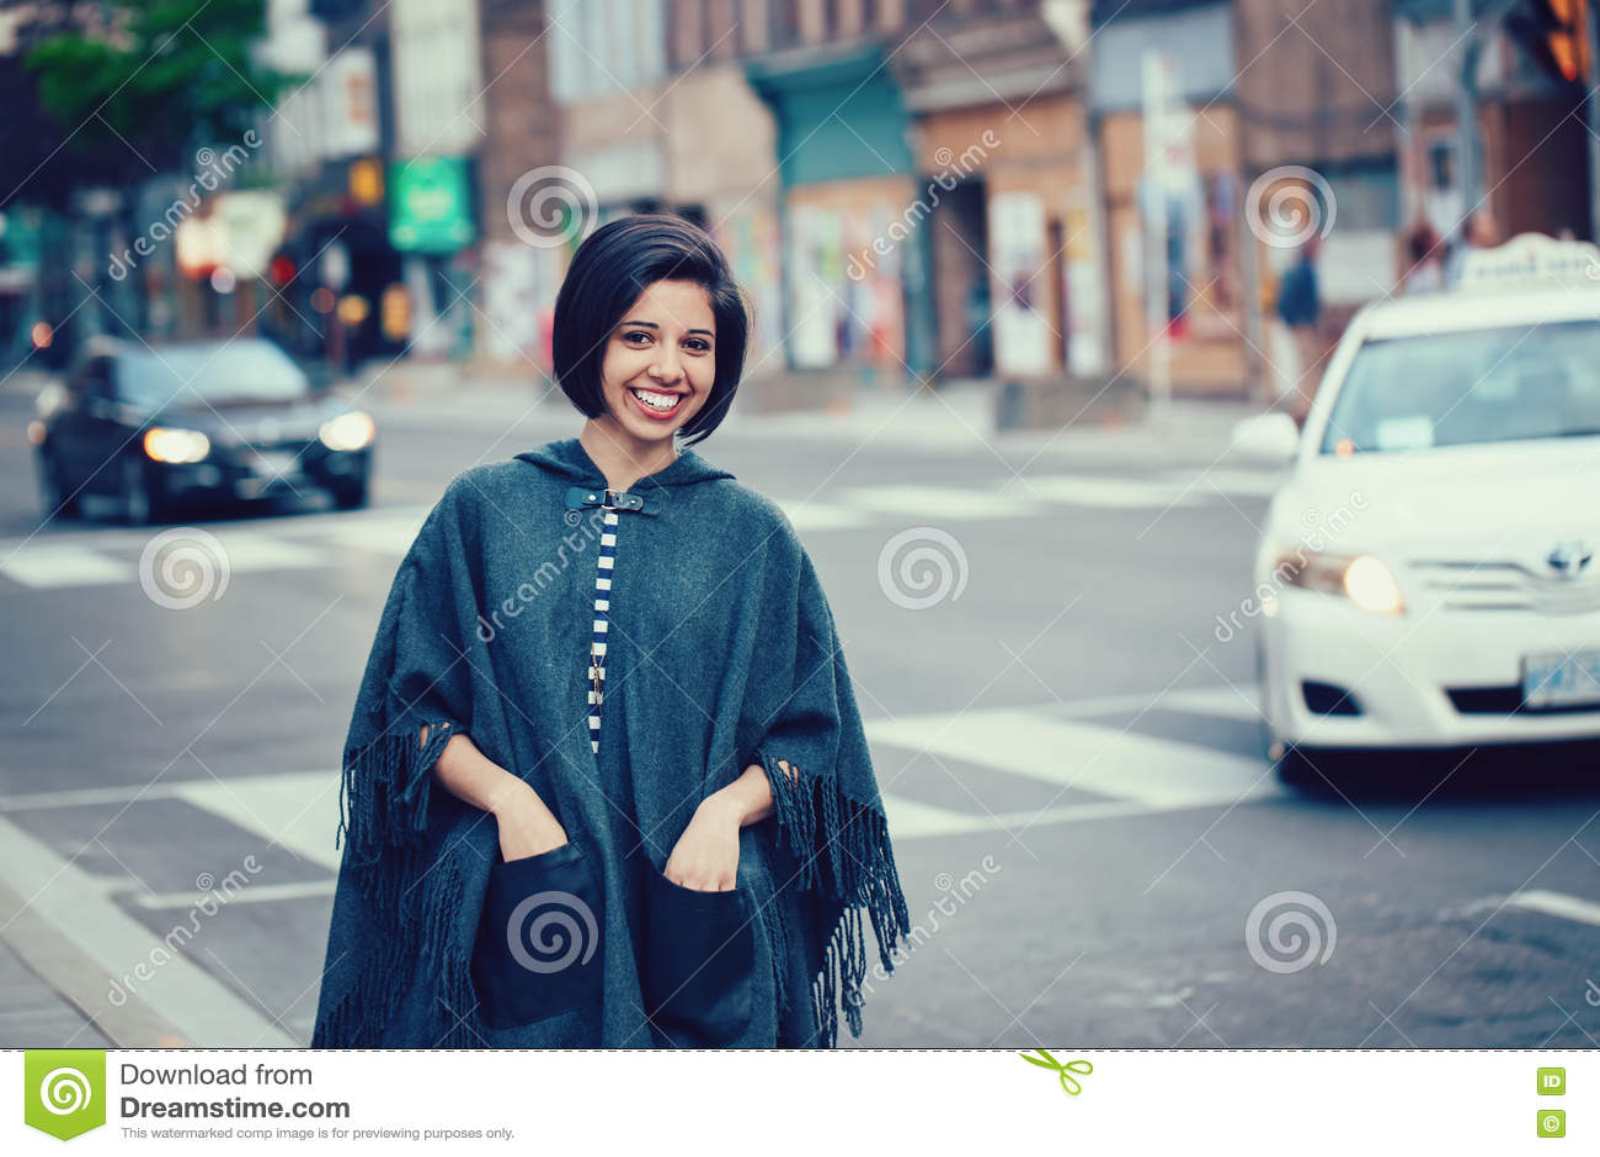 Portrait Of Beautiful Smiling Young Hipster Latin Hispanic